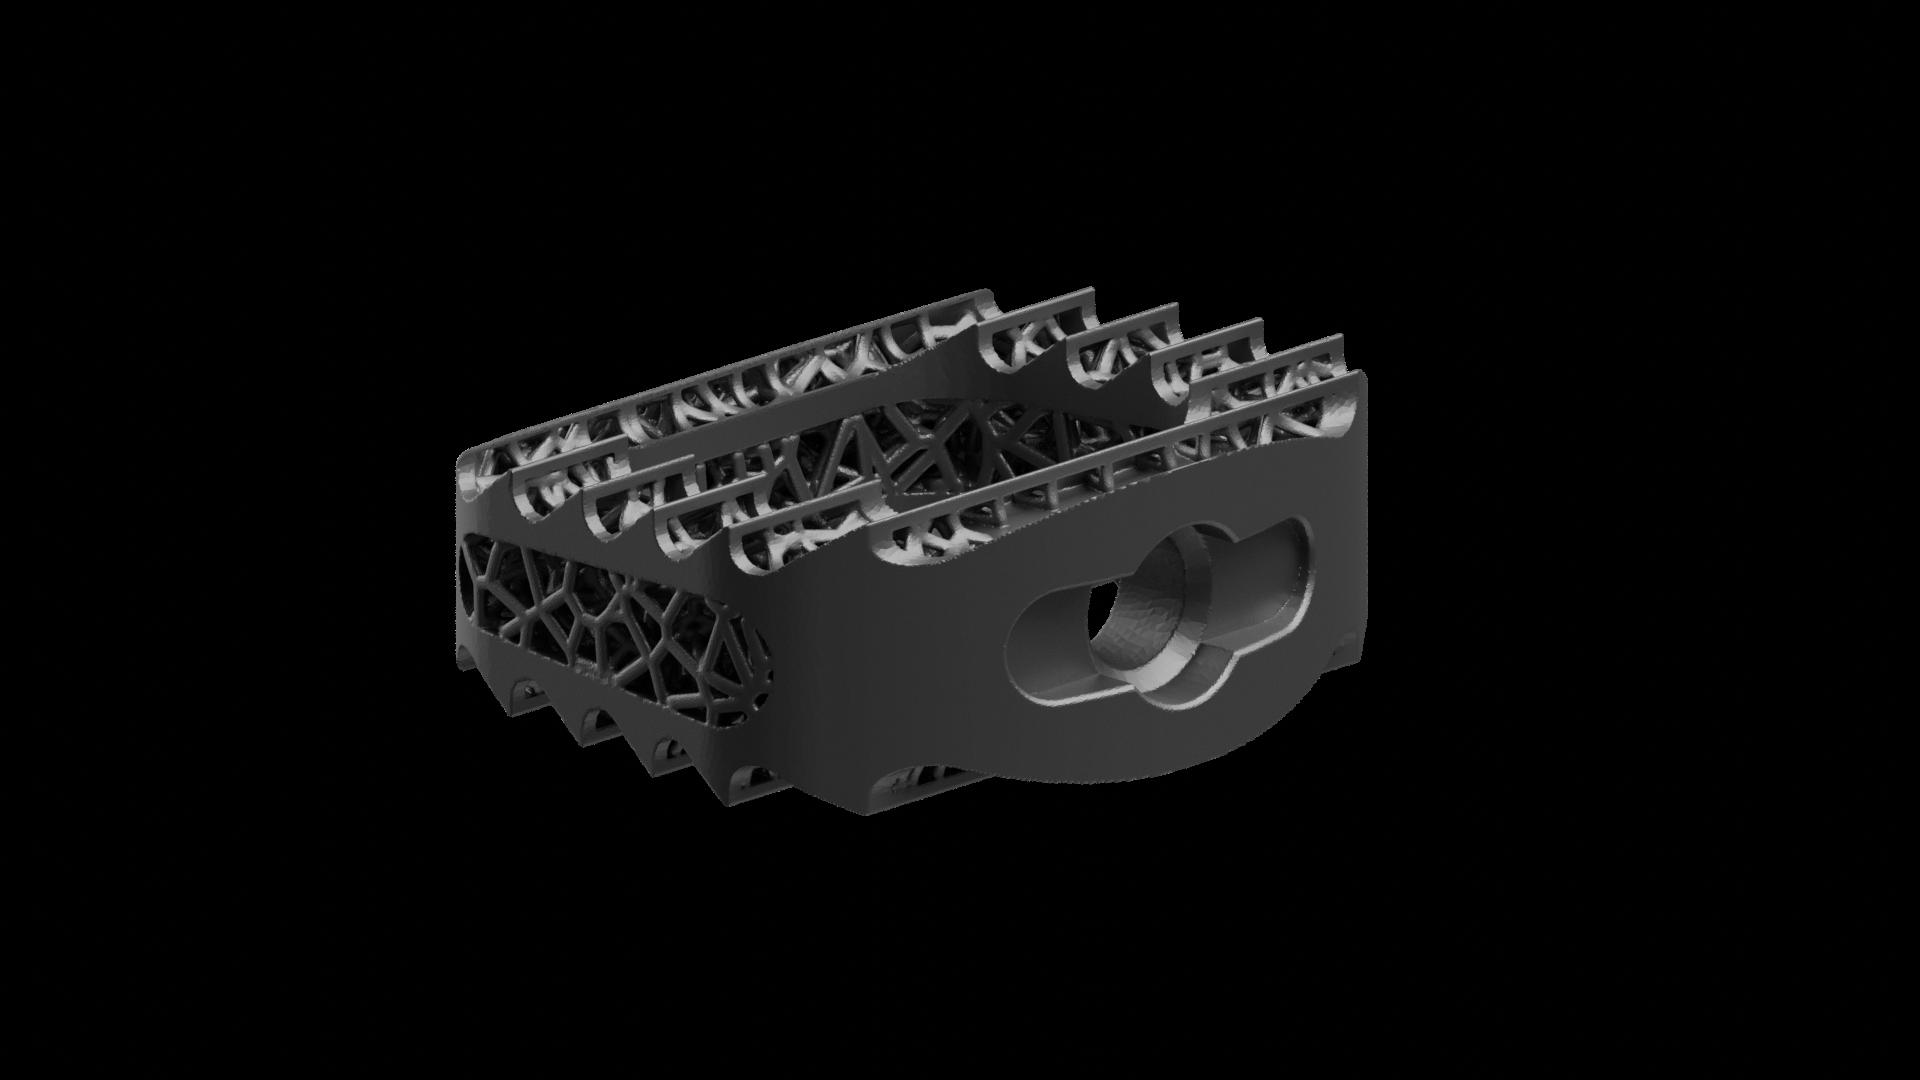 Latticed, aggressive teeth, color: black, 3D Printed Titanium Cervical IBFD implant